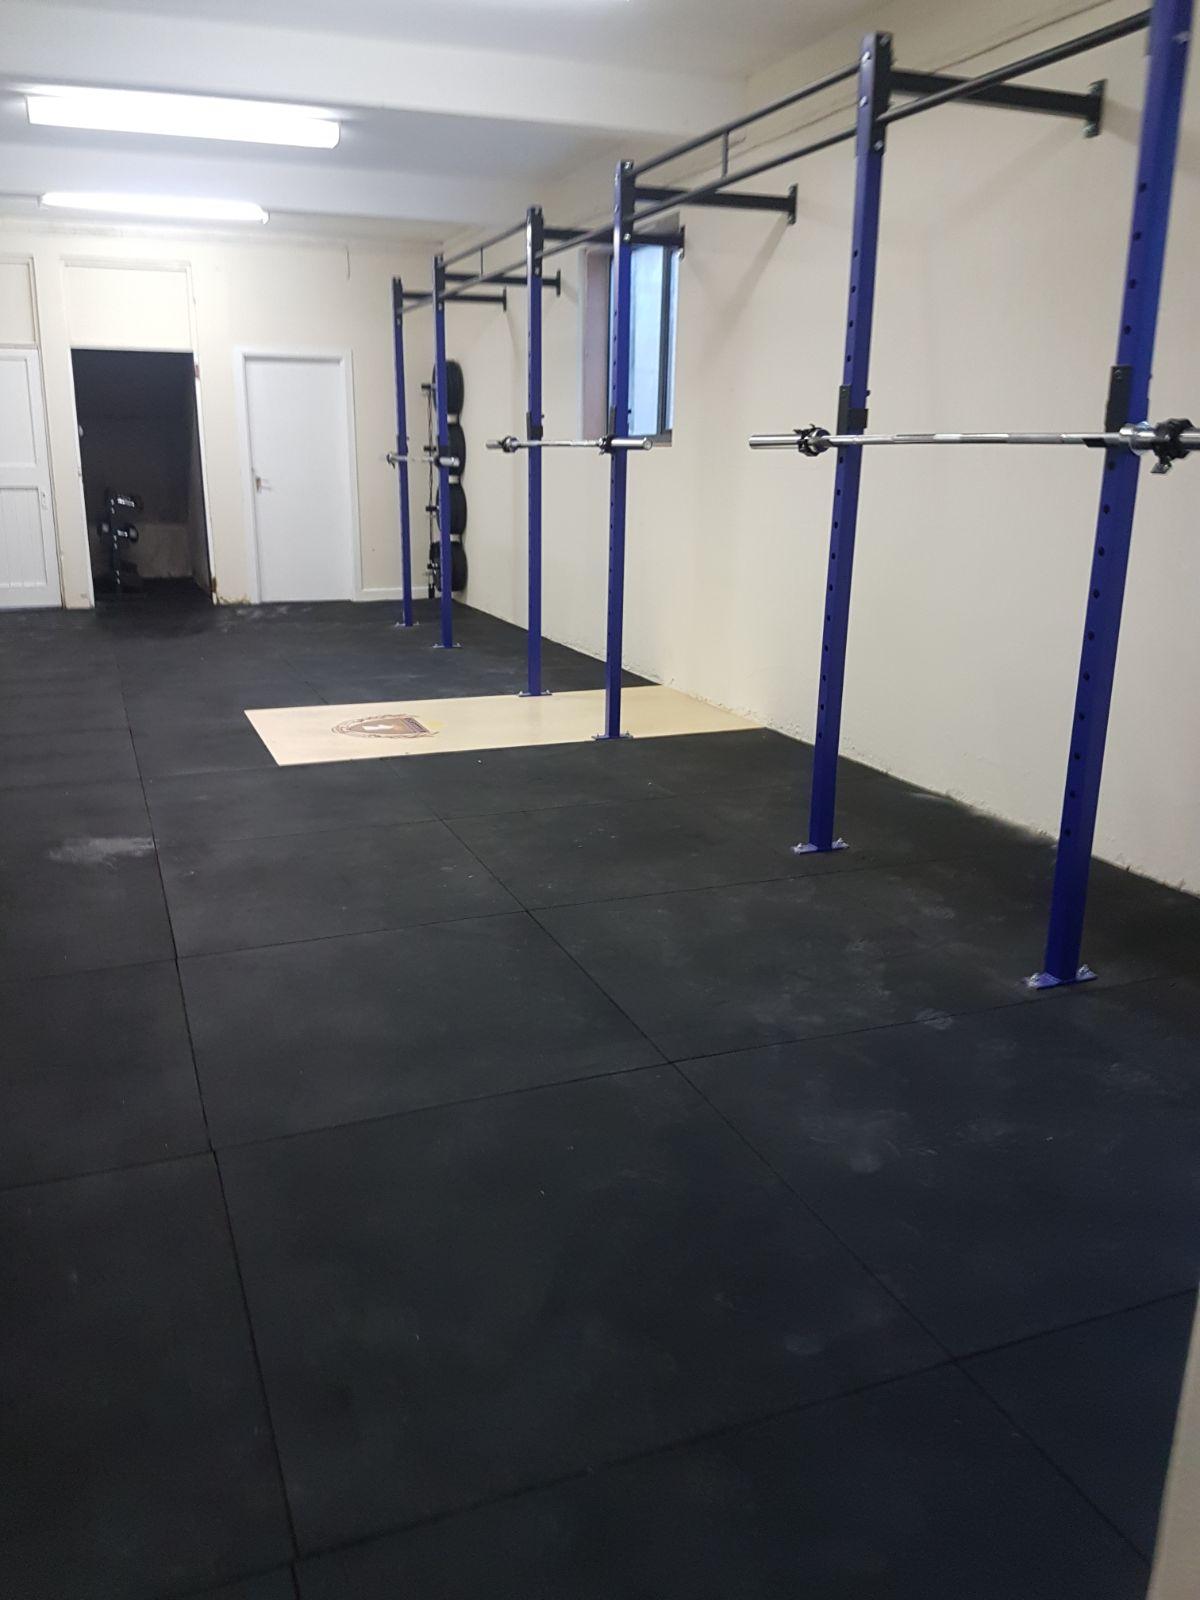 Crossfit Flooring Fitness Equipment Ireland Best For